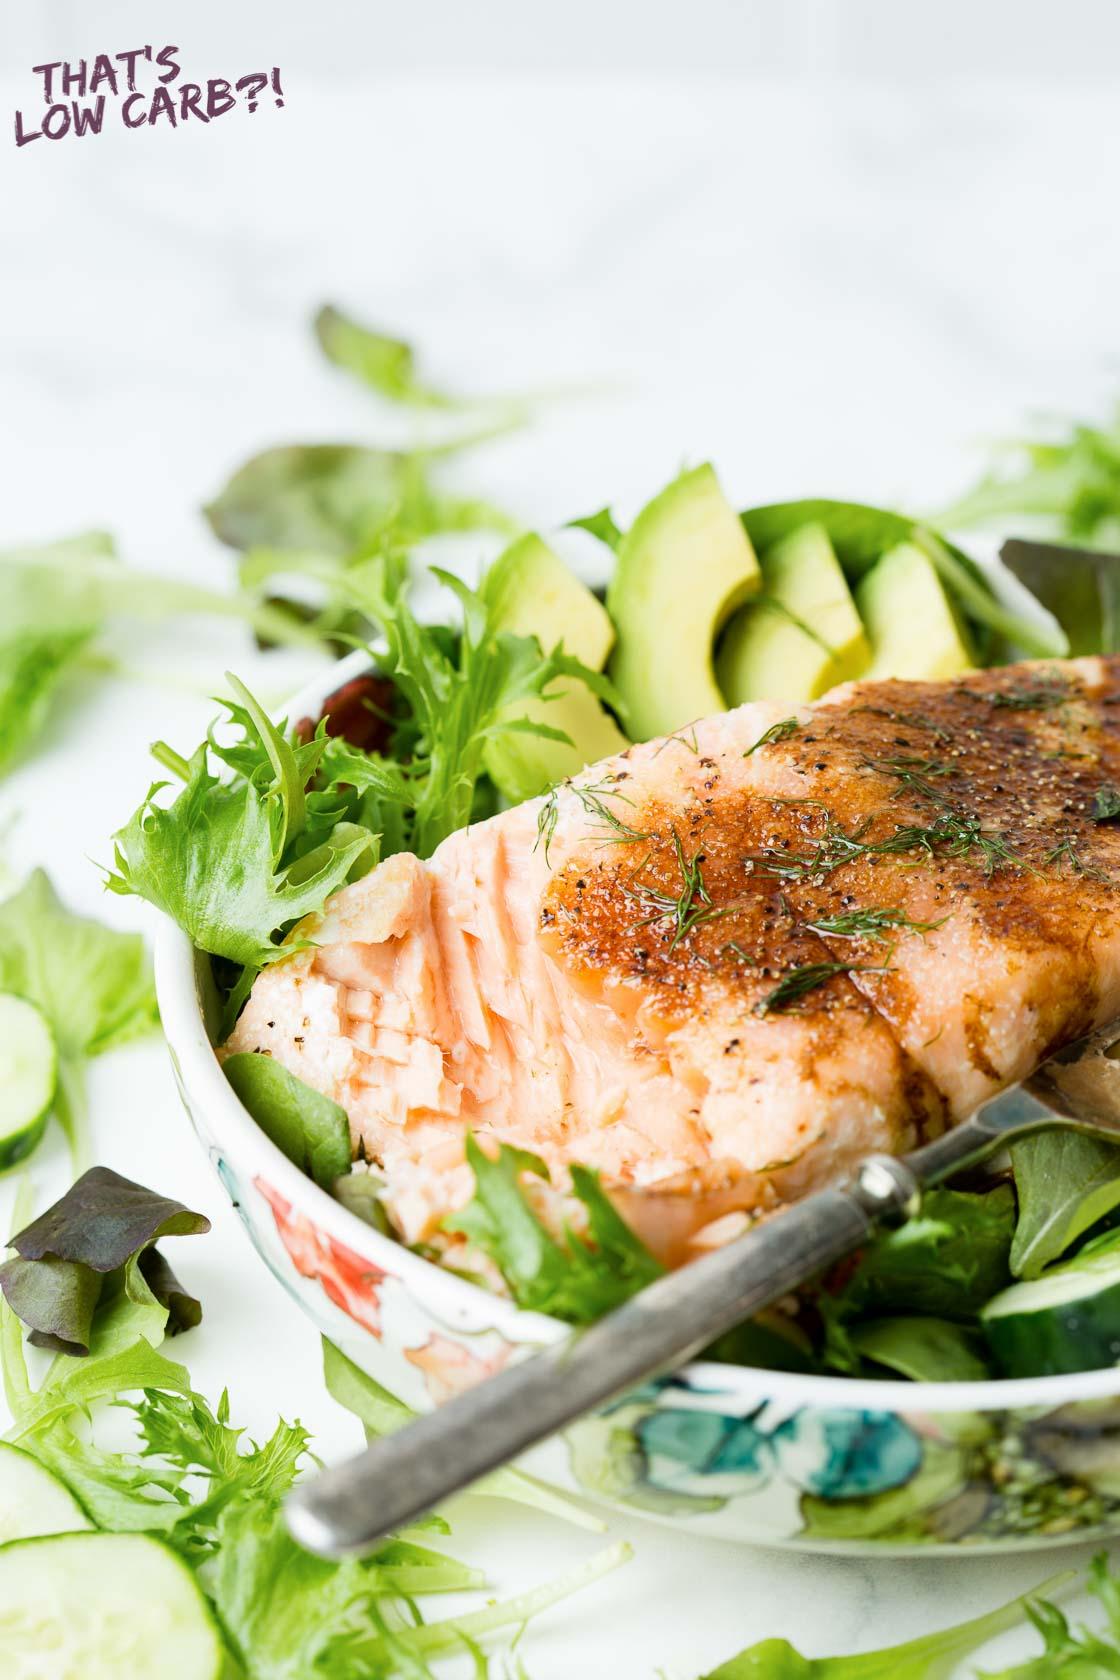 Keto Salmon Salad with Balsamic Dressing